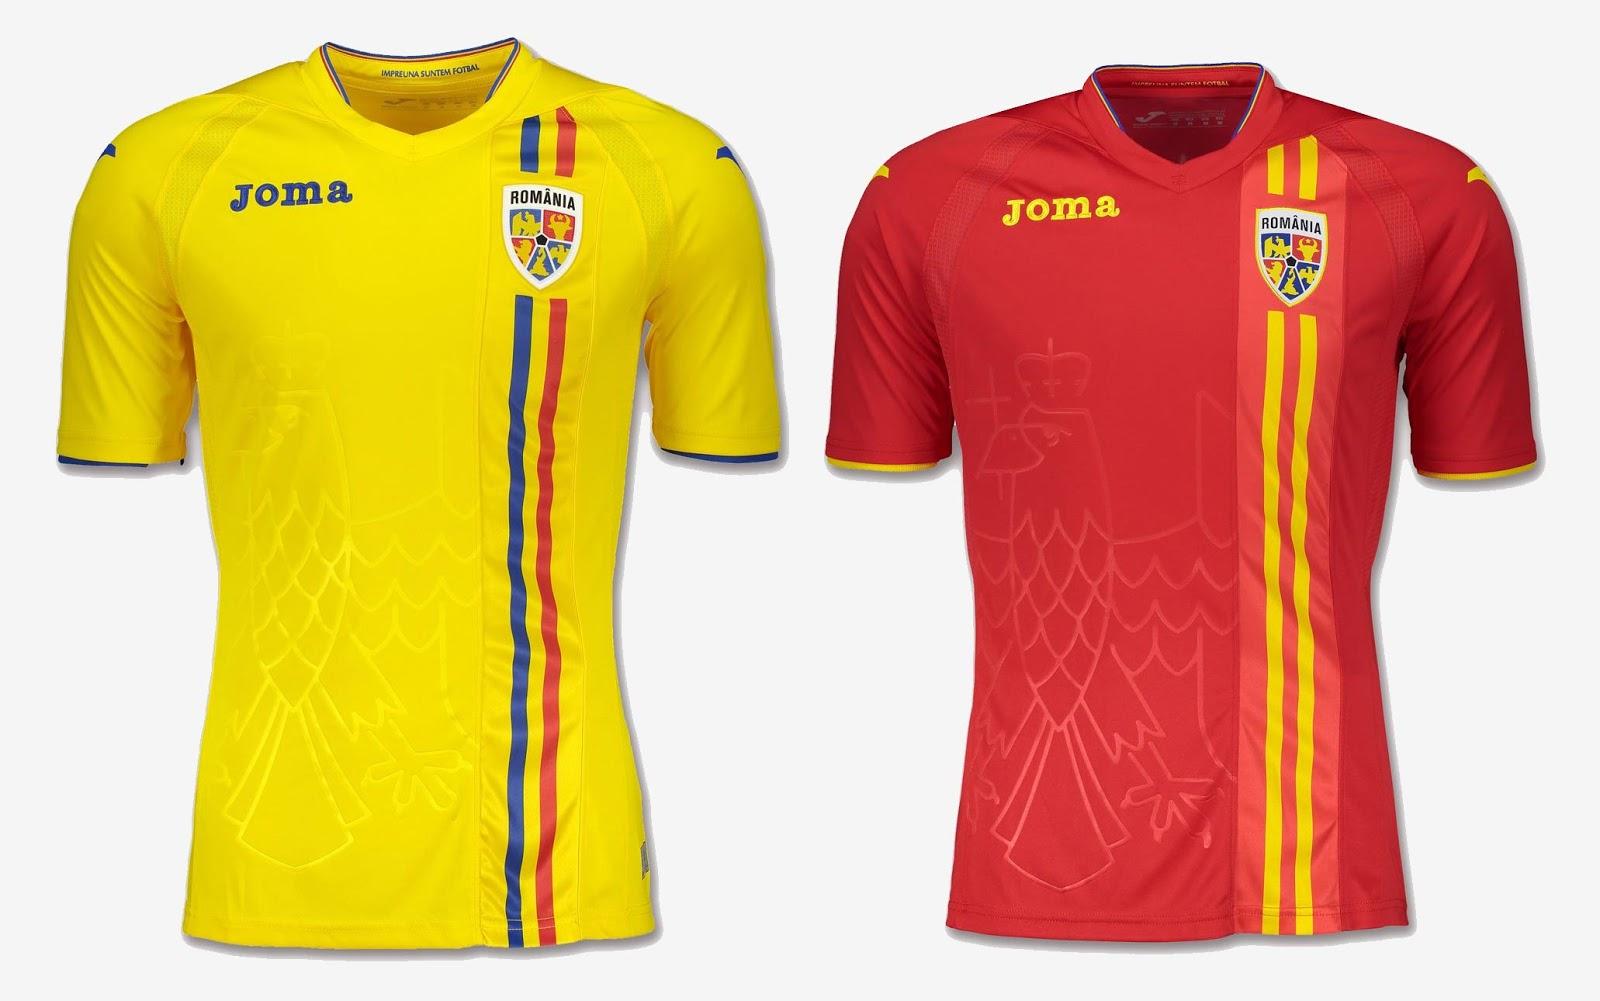 Roemenië voetbalshirts 2018-2019 - Voetbalshirts.com